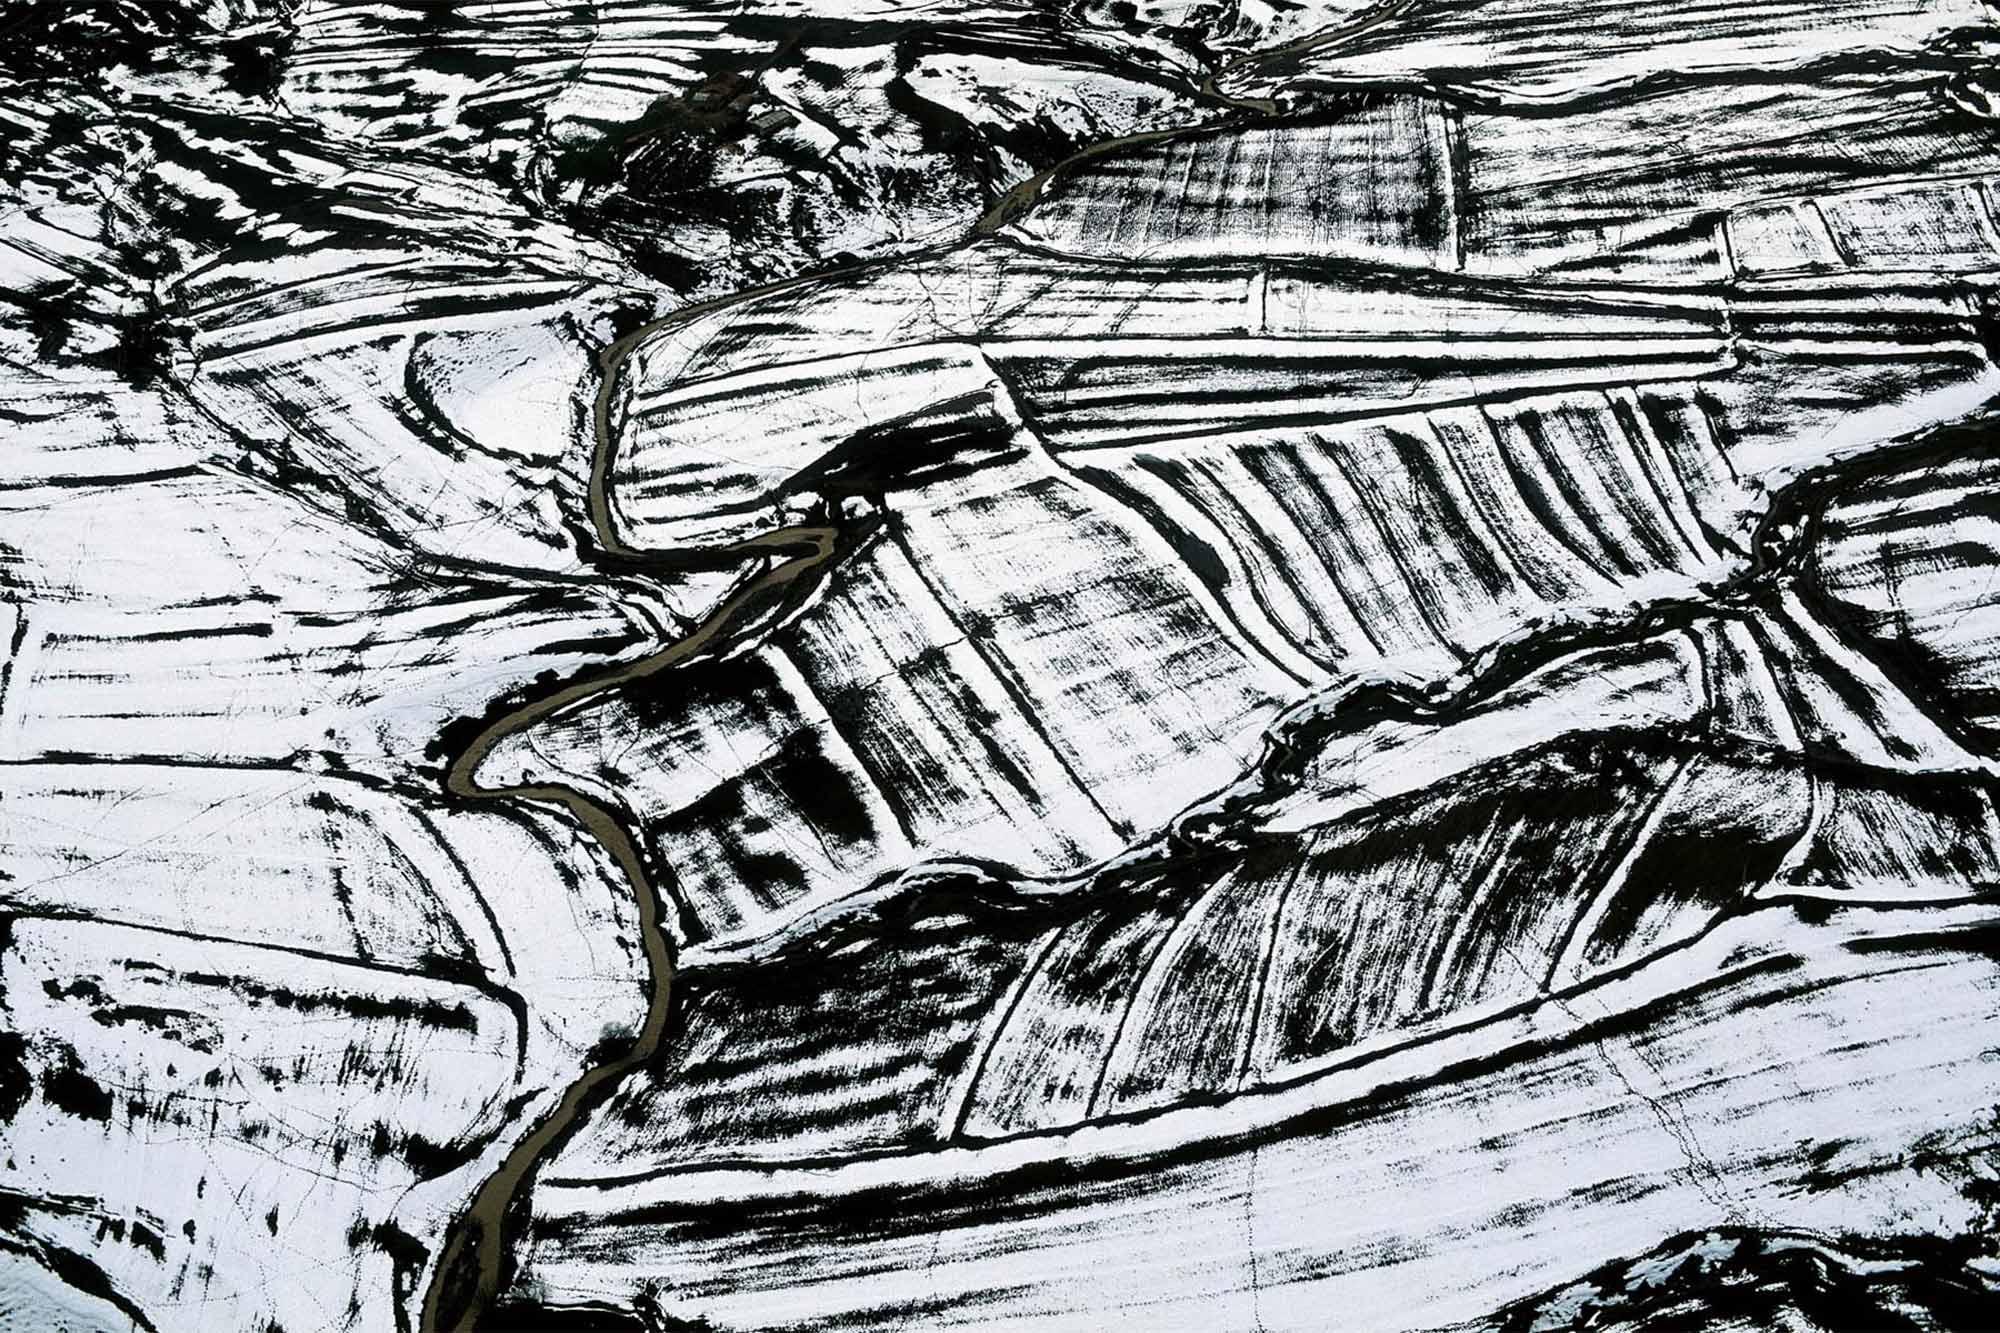 Hodna - Yann Arthus-Bertrand